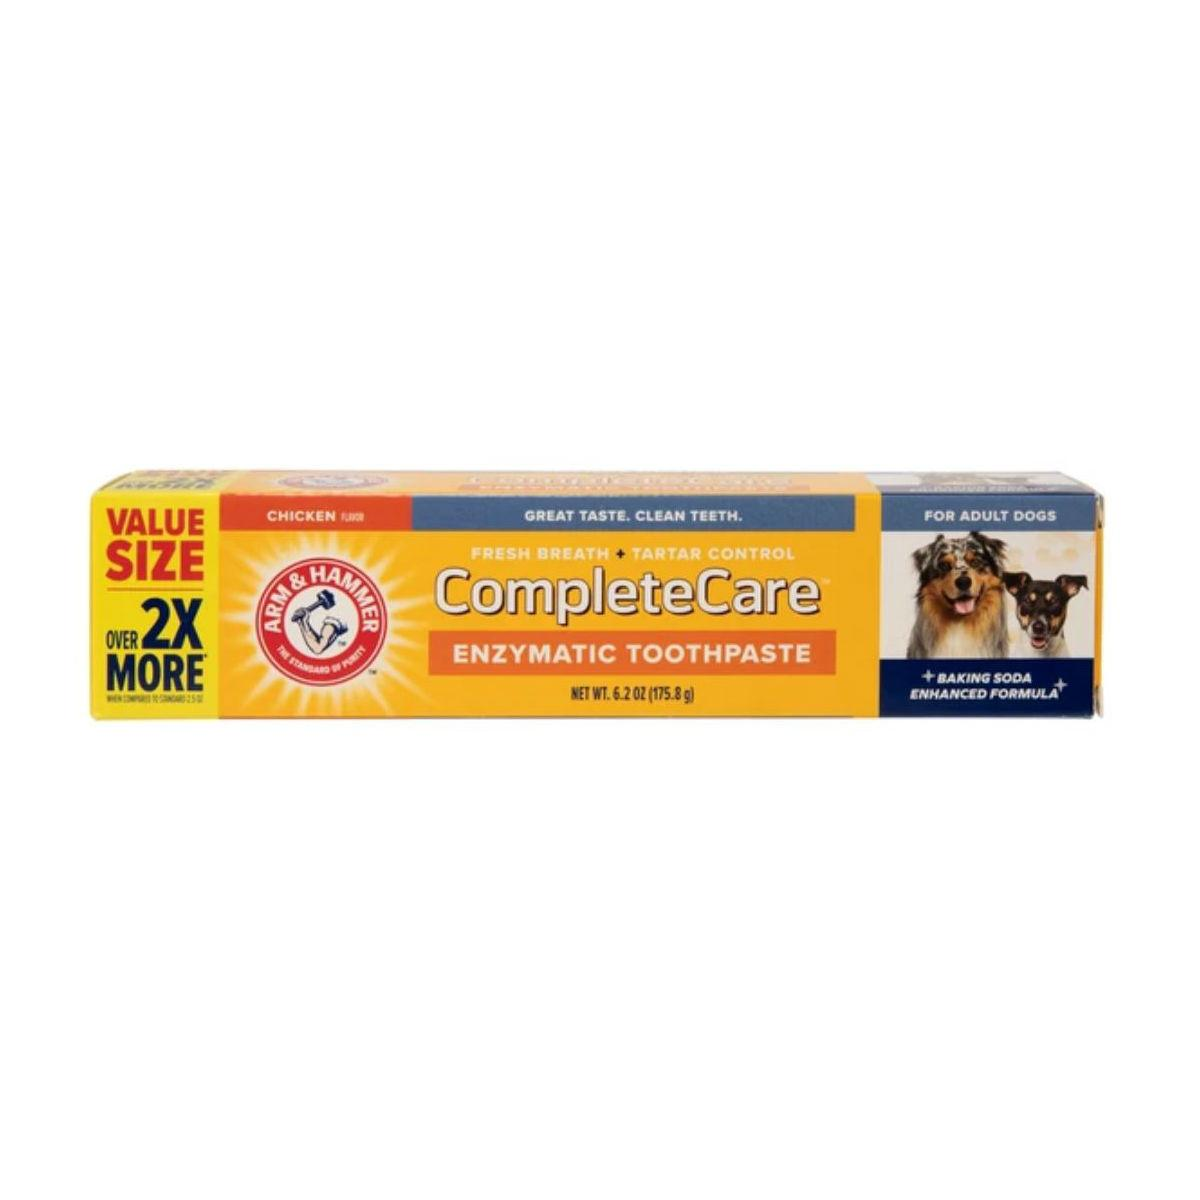 Arm & Hammer Dental Complete Care Dog Toothpaste - Chicken